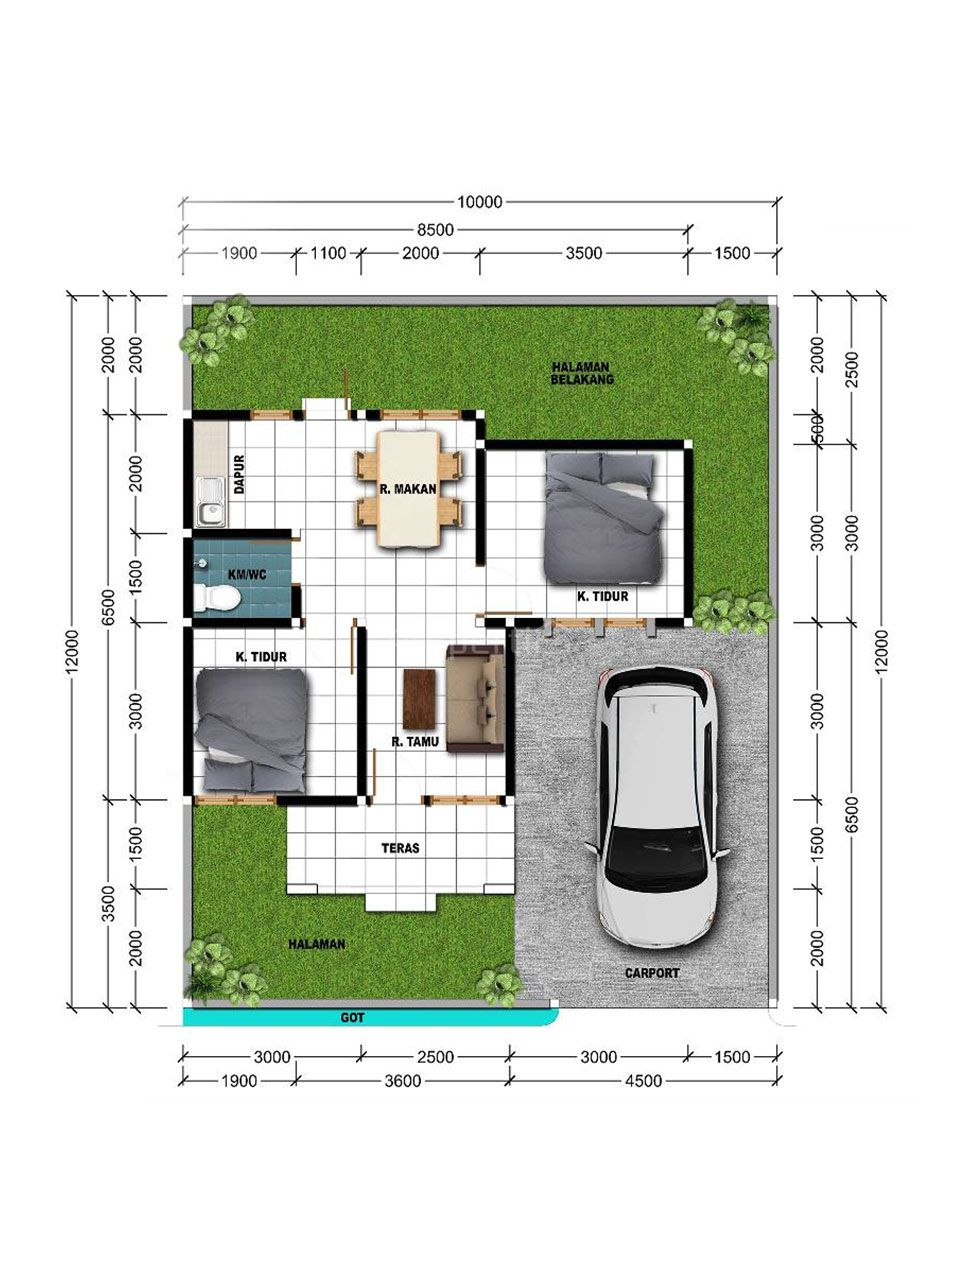 New Cluster House Ready to Occupy in Jimbaran, Kuta Selatan